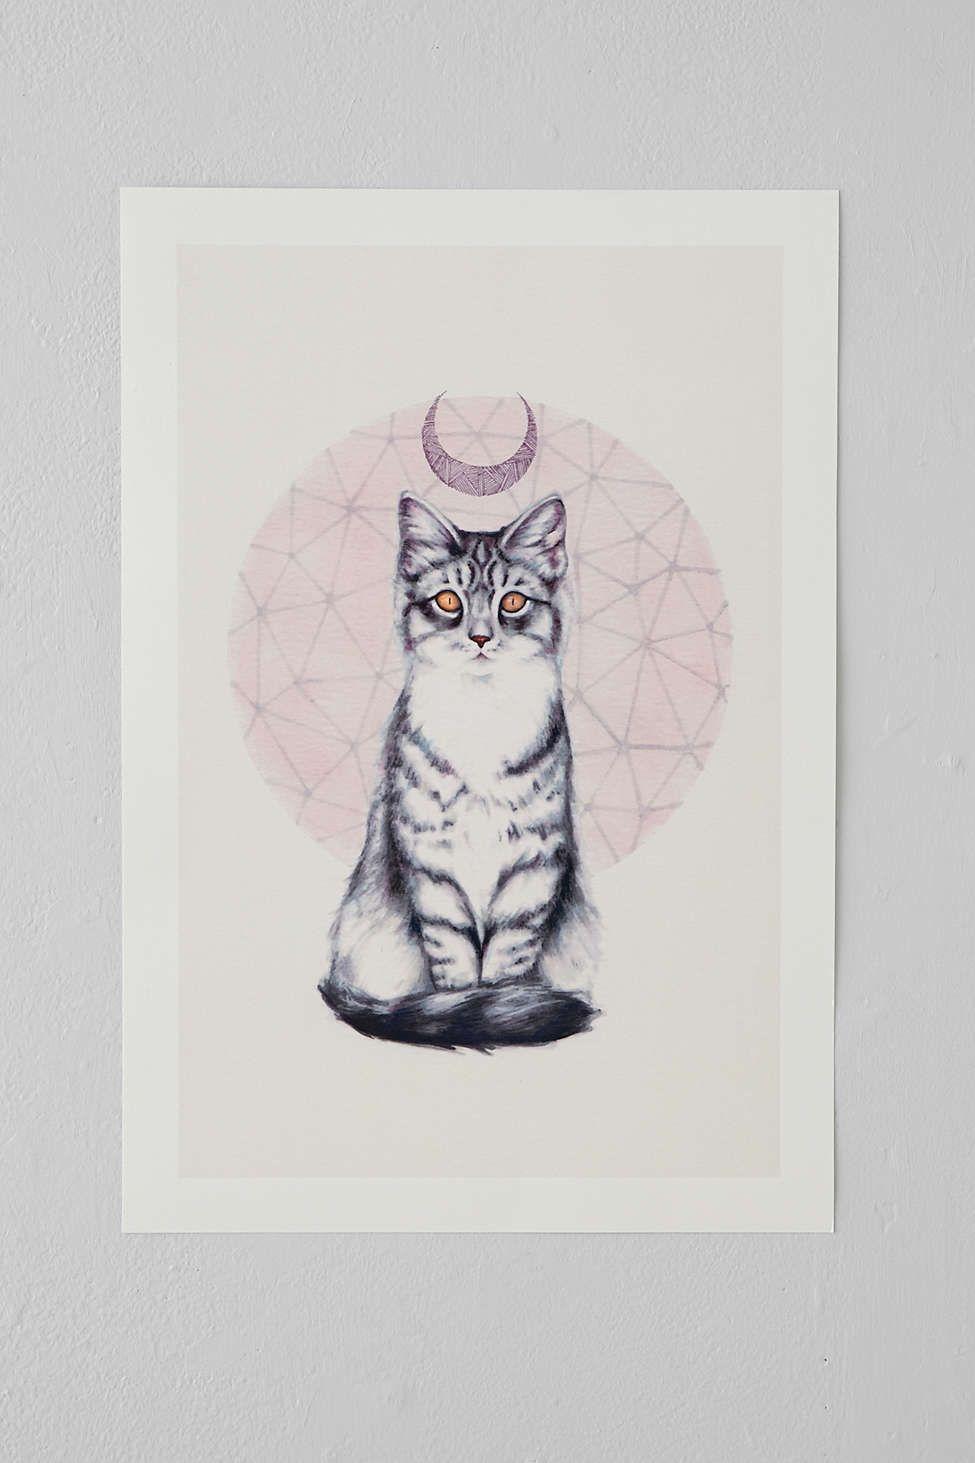 P. Carrington Mystic Kitten Art Print.